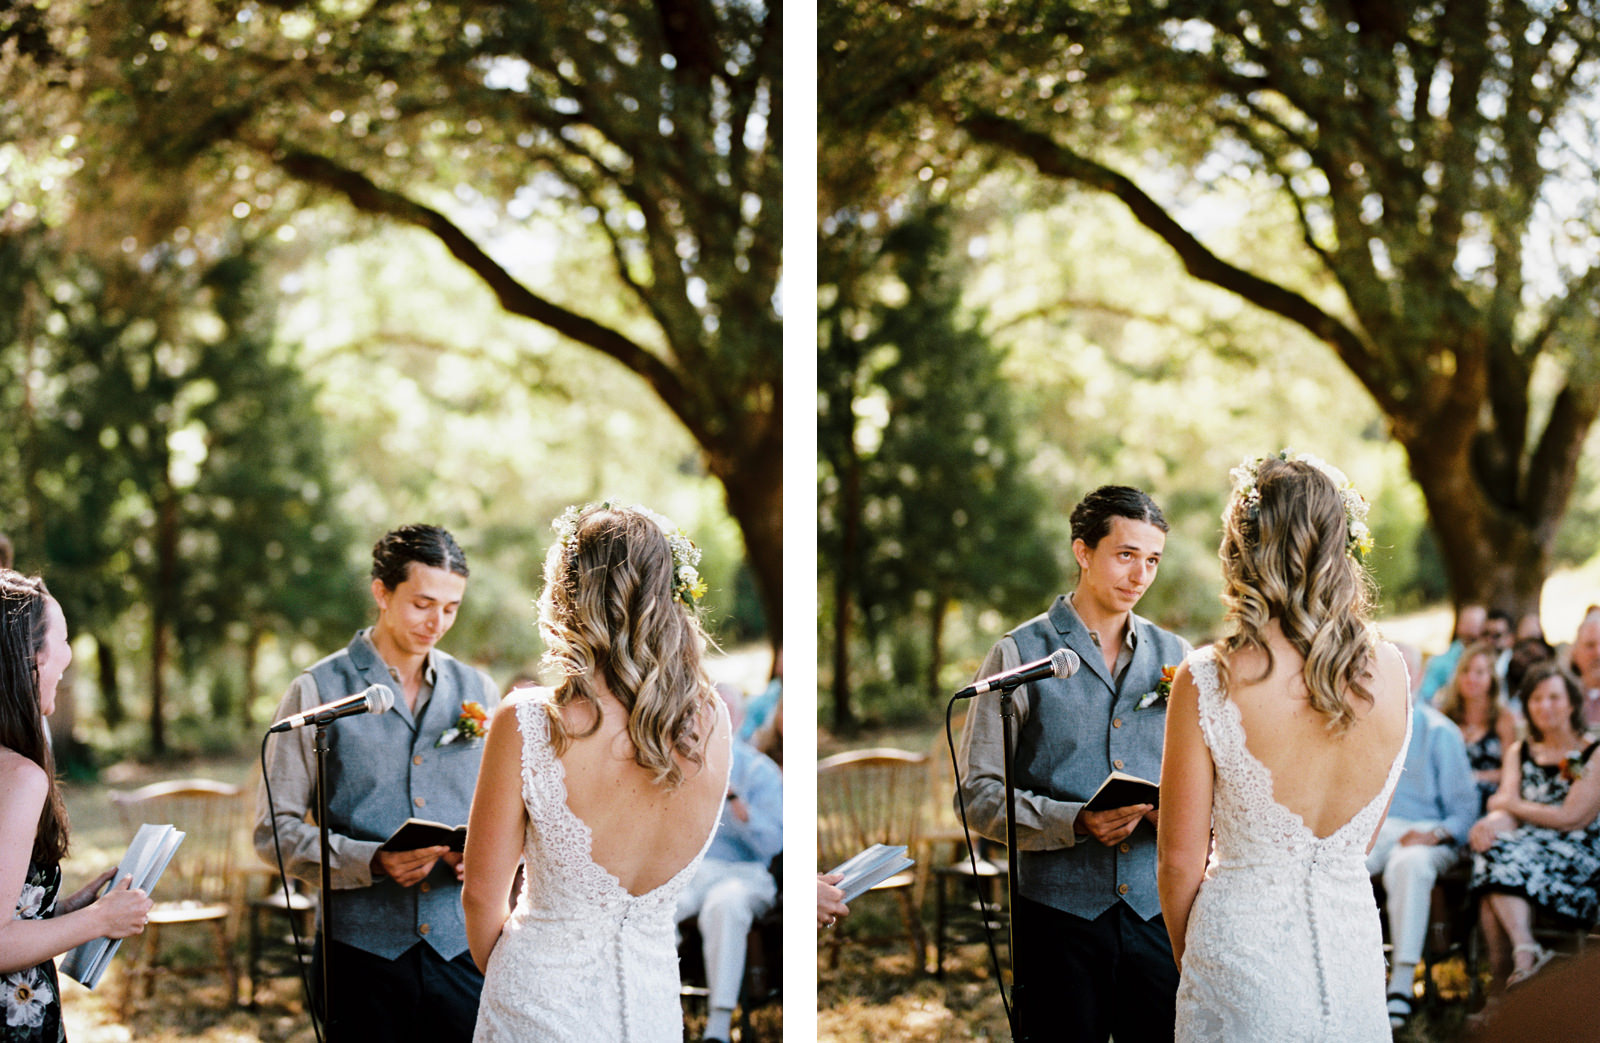 rivers-bend-retreat-wedding-033 RIVER'S BEND RETREAT WEDDING